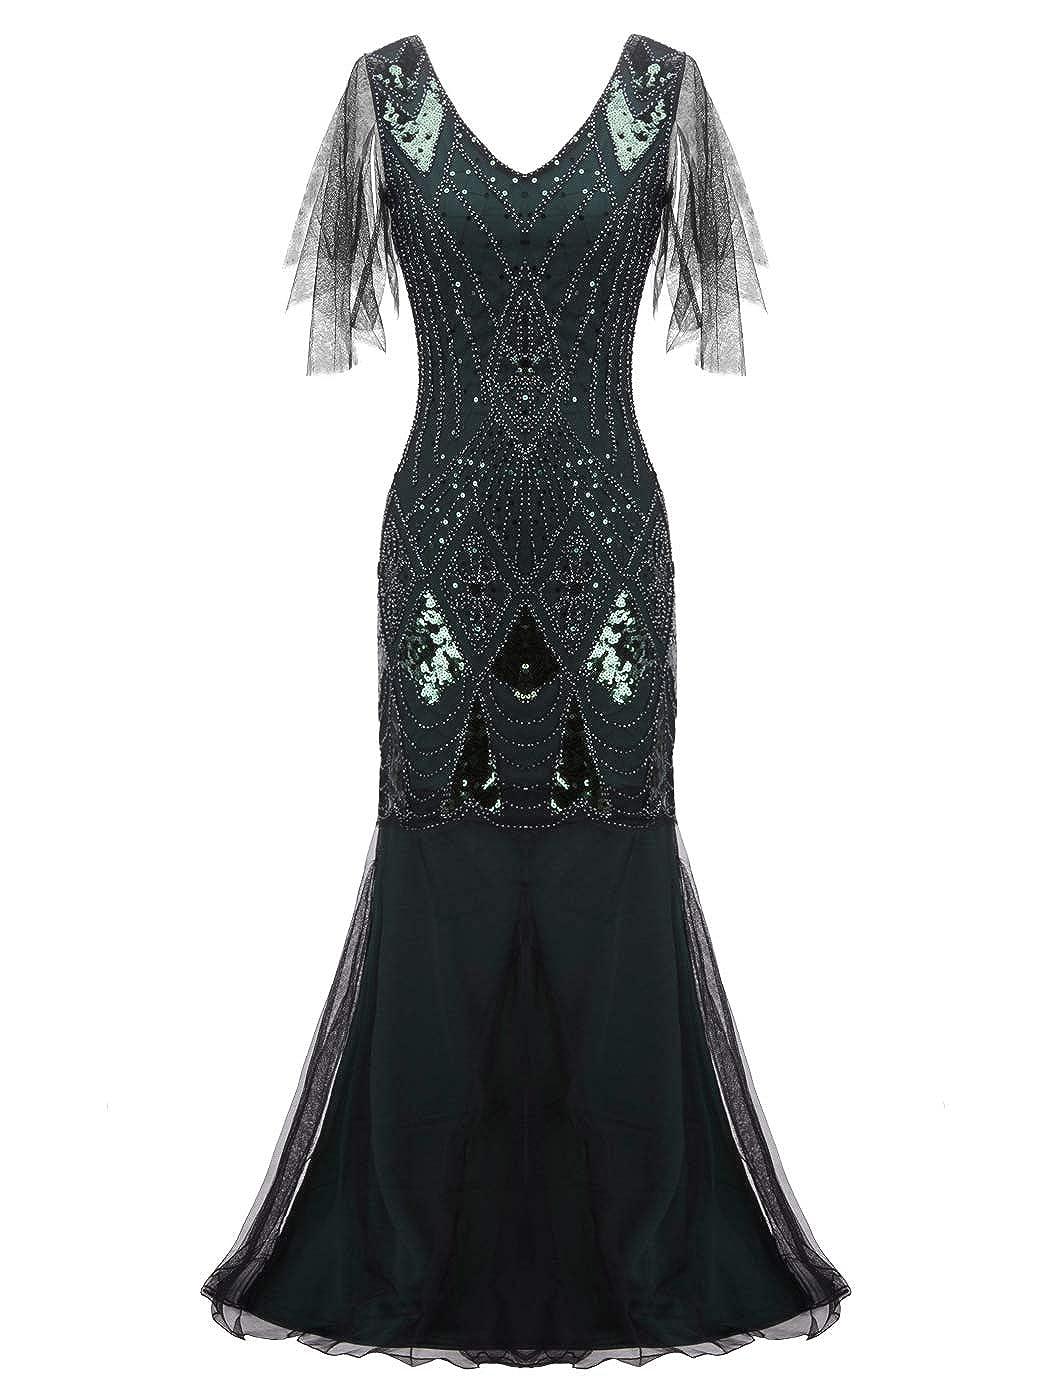 023green FAIRY COUPLE 1920s FloorLength VBack Sequined Embellished Prom Evening Dress D20S004